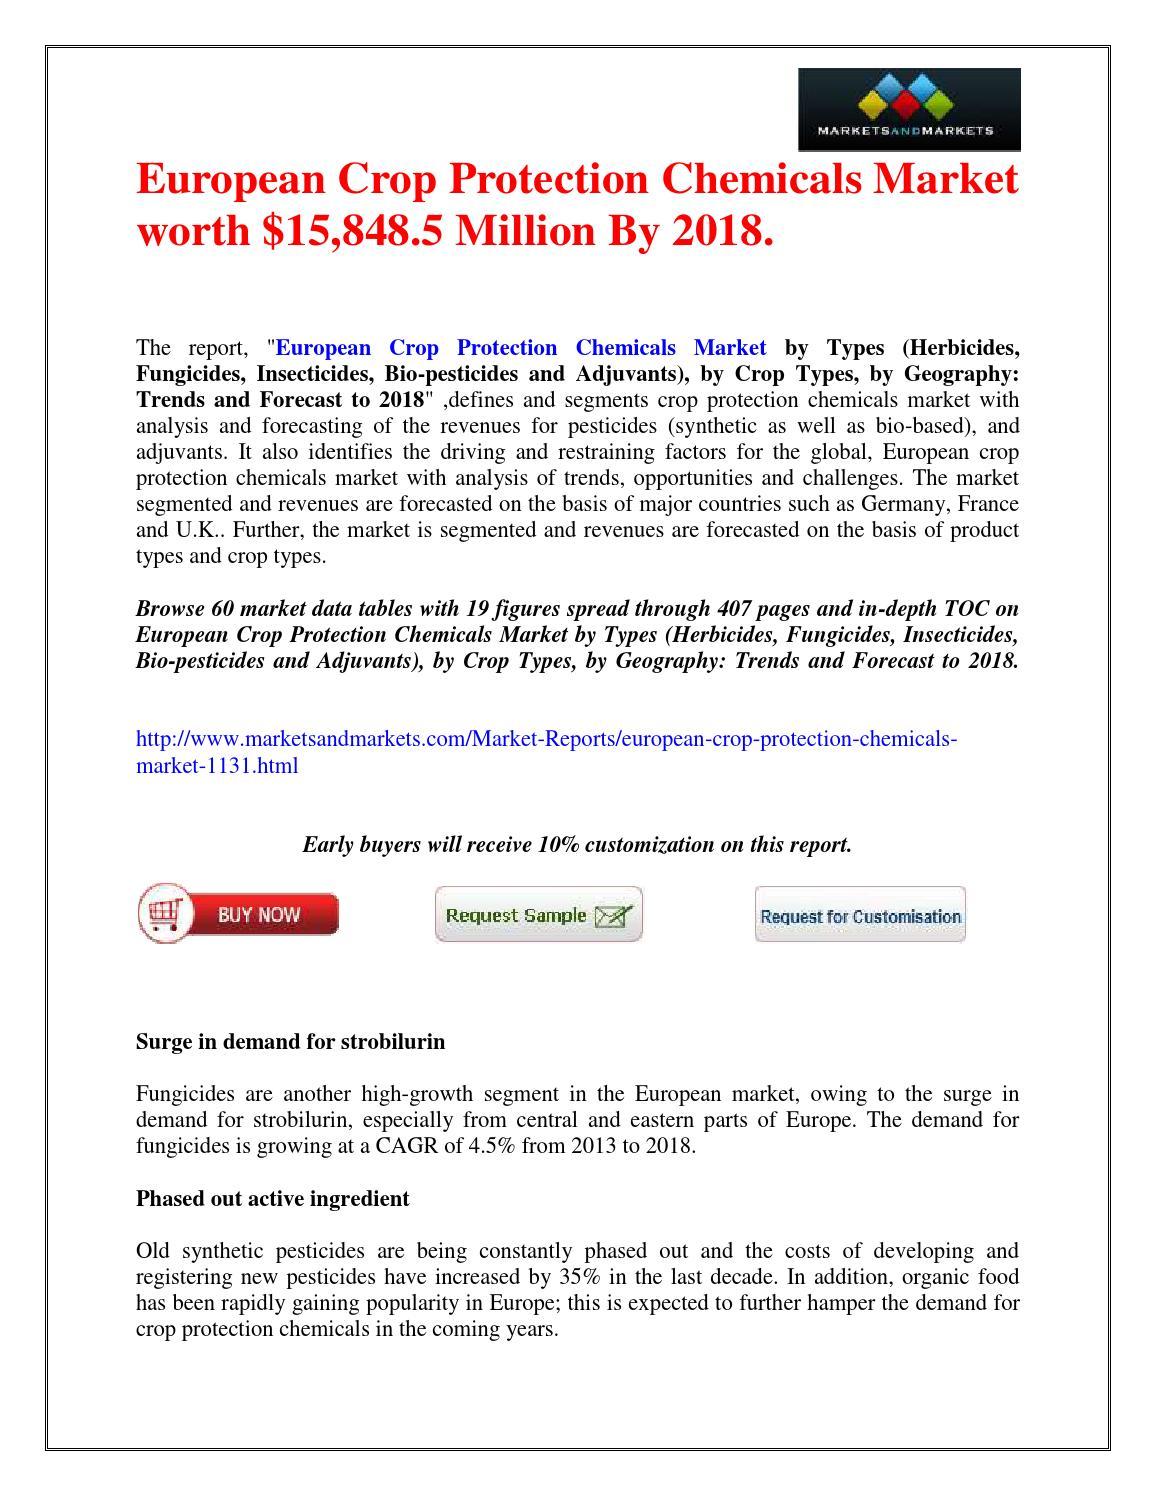 European Crop Protection Chemicals Market worth $15,848 5